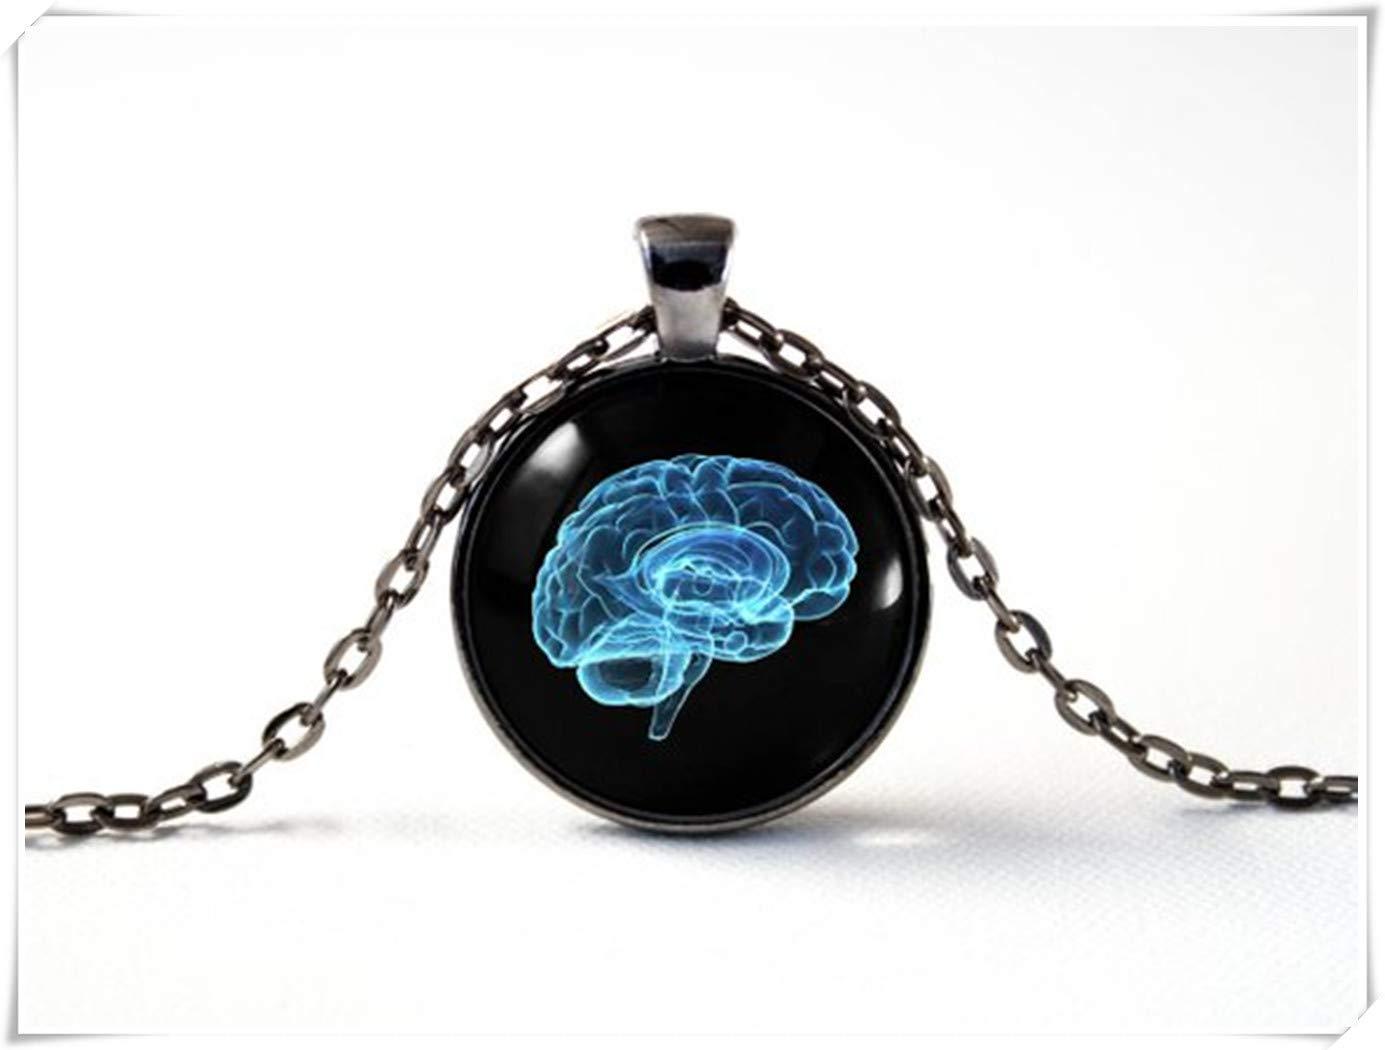 A little little love Human Brain Necklace,Anatomical Necklace Jewellery, Brain Jewelry,Anatomy Jewelry, Brain Pendant,Geeky Neuroscience